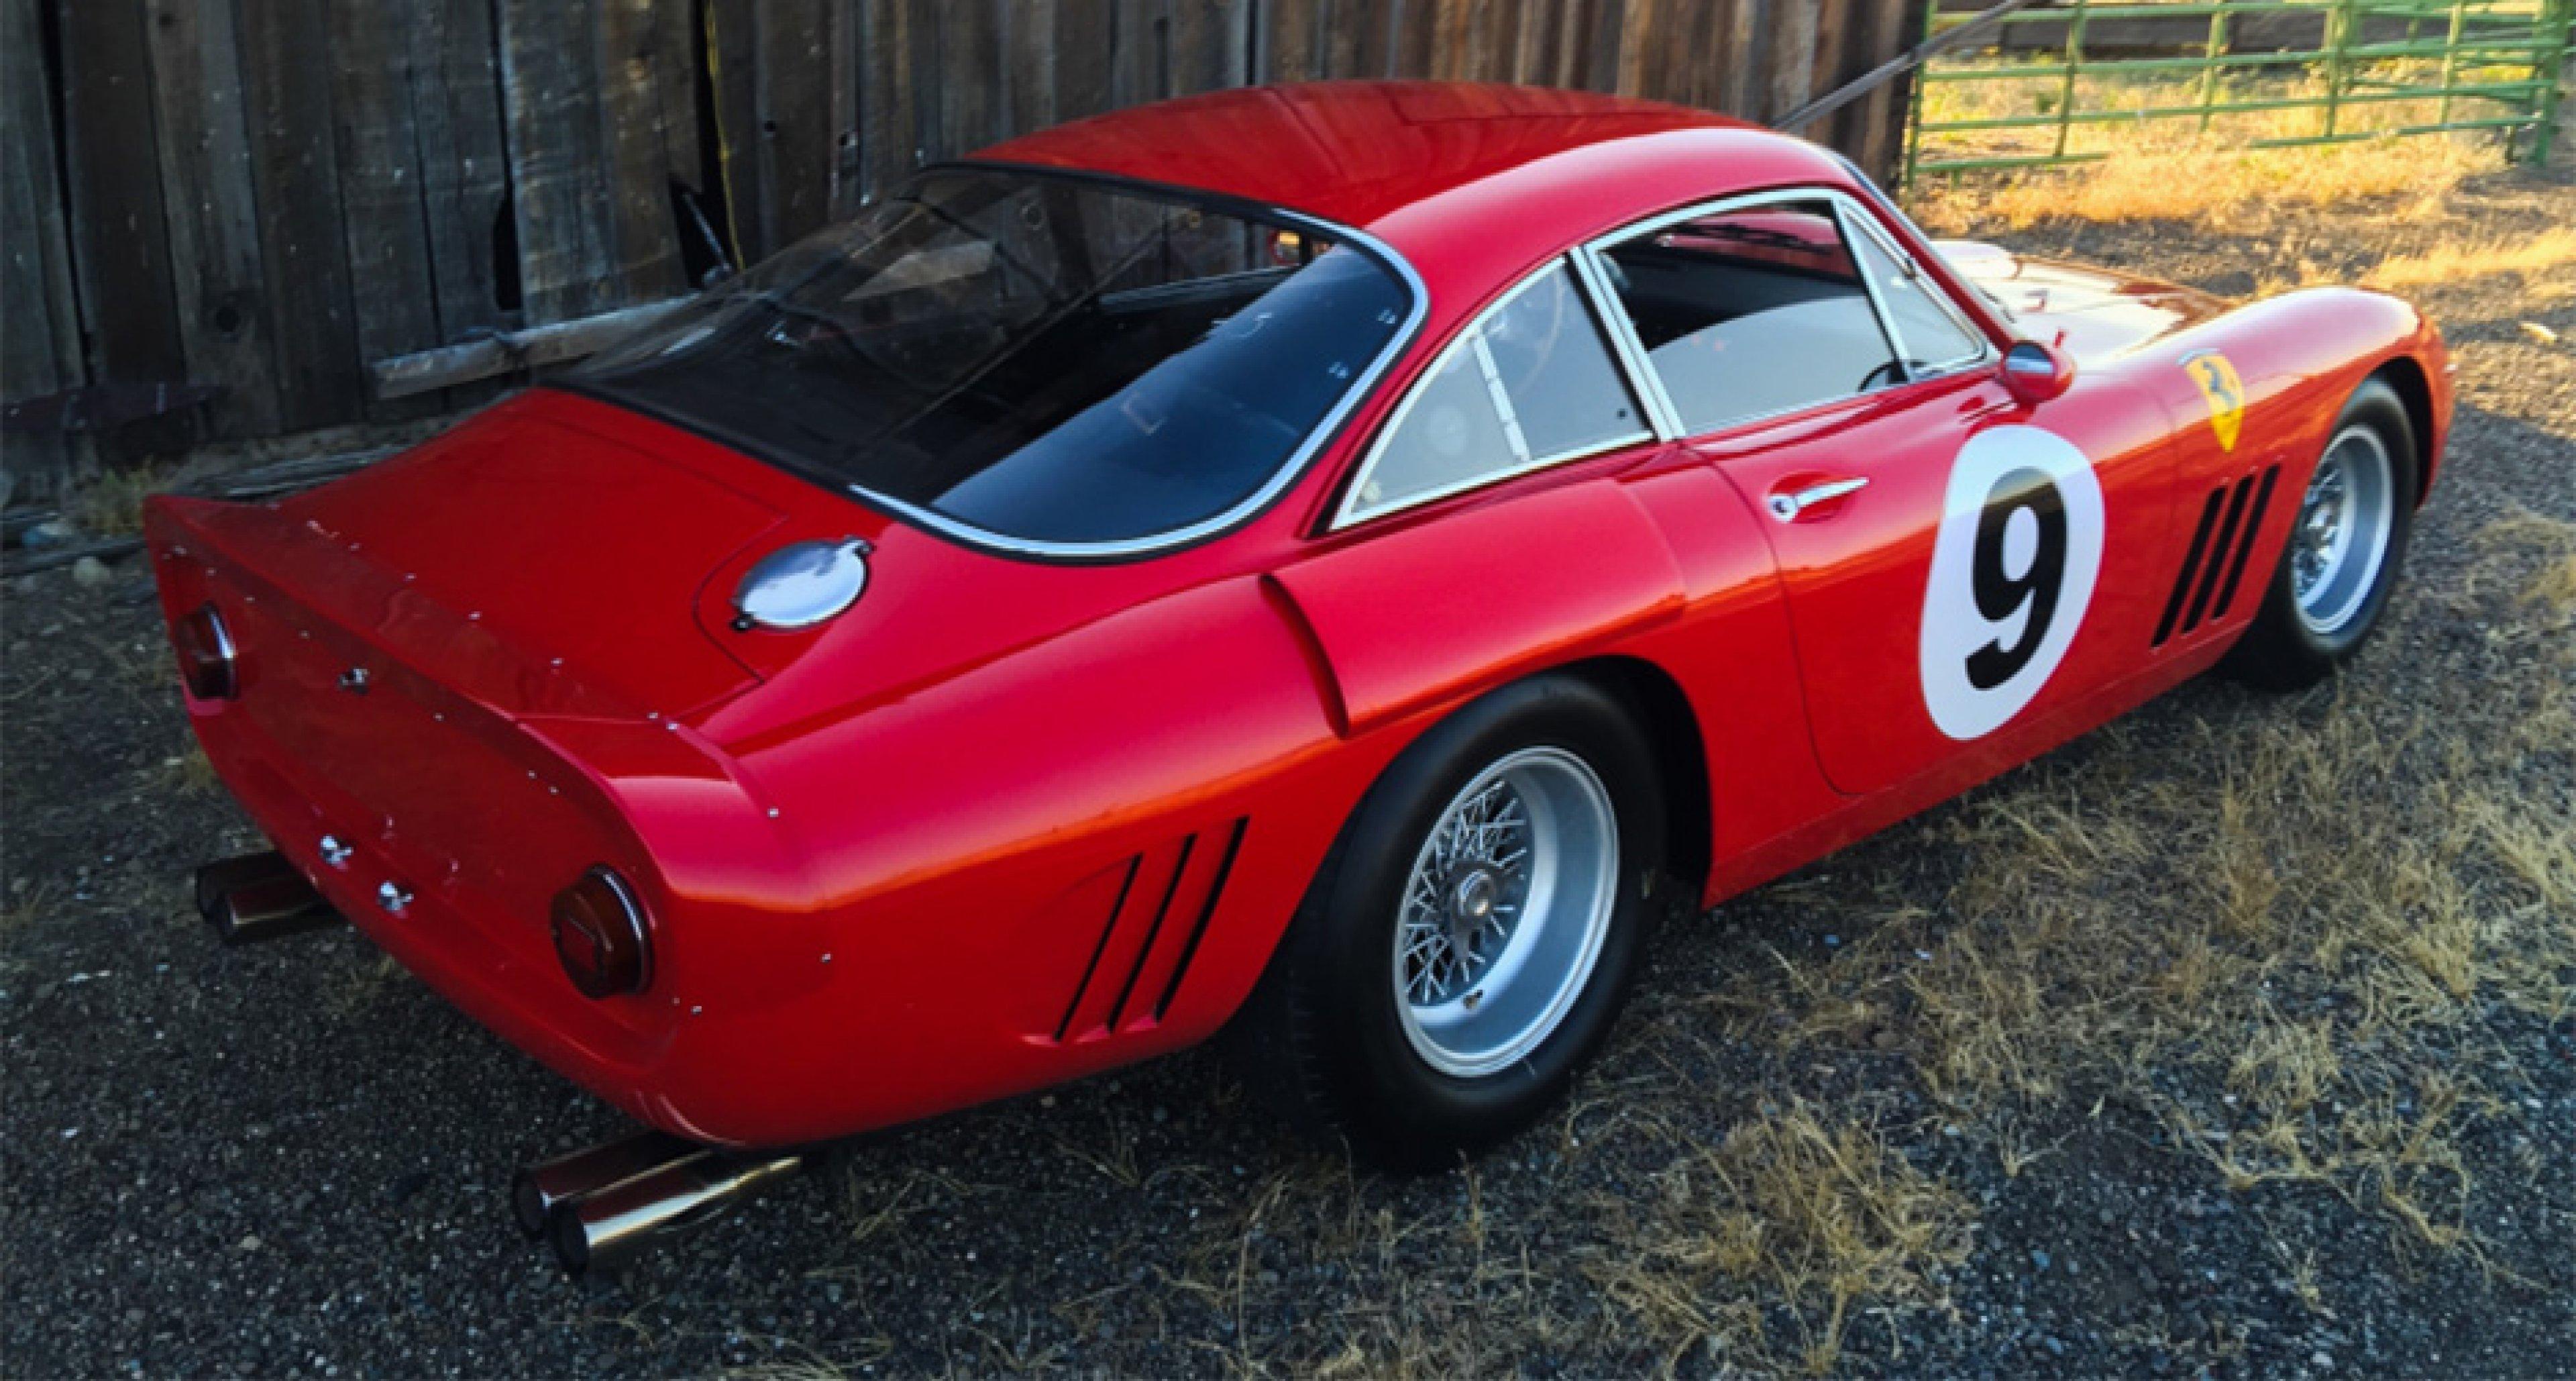 Dieser Ferrari 330 Lmb Lässt Jeden 250 Gto Erblassen Classic Driver Magazine